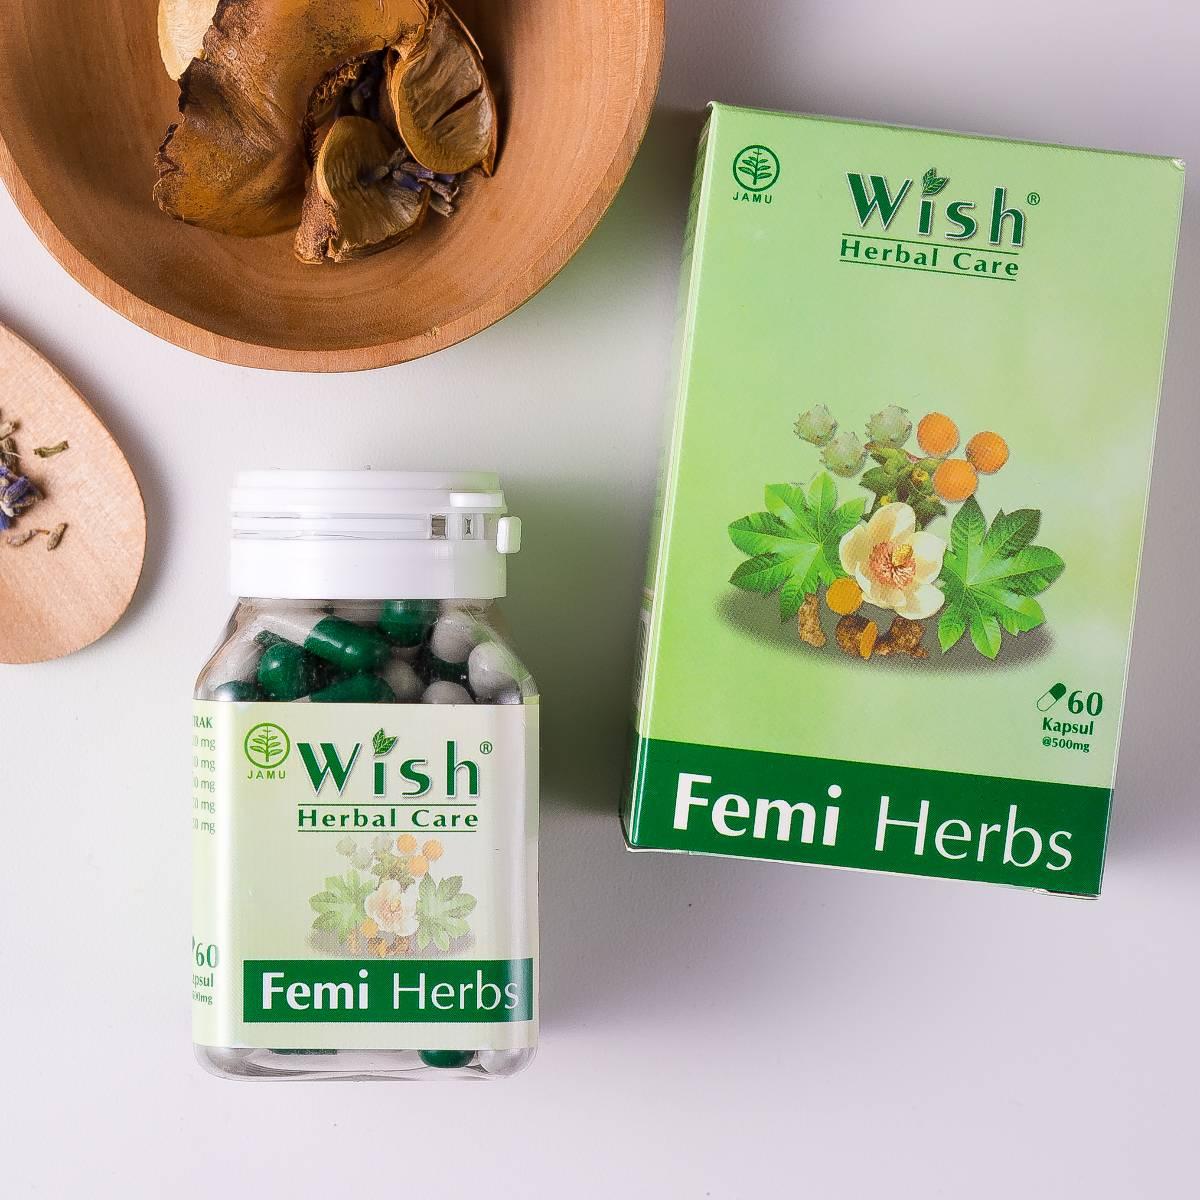 Femmi Herbs (capsule)